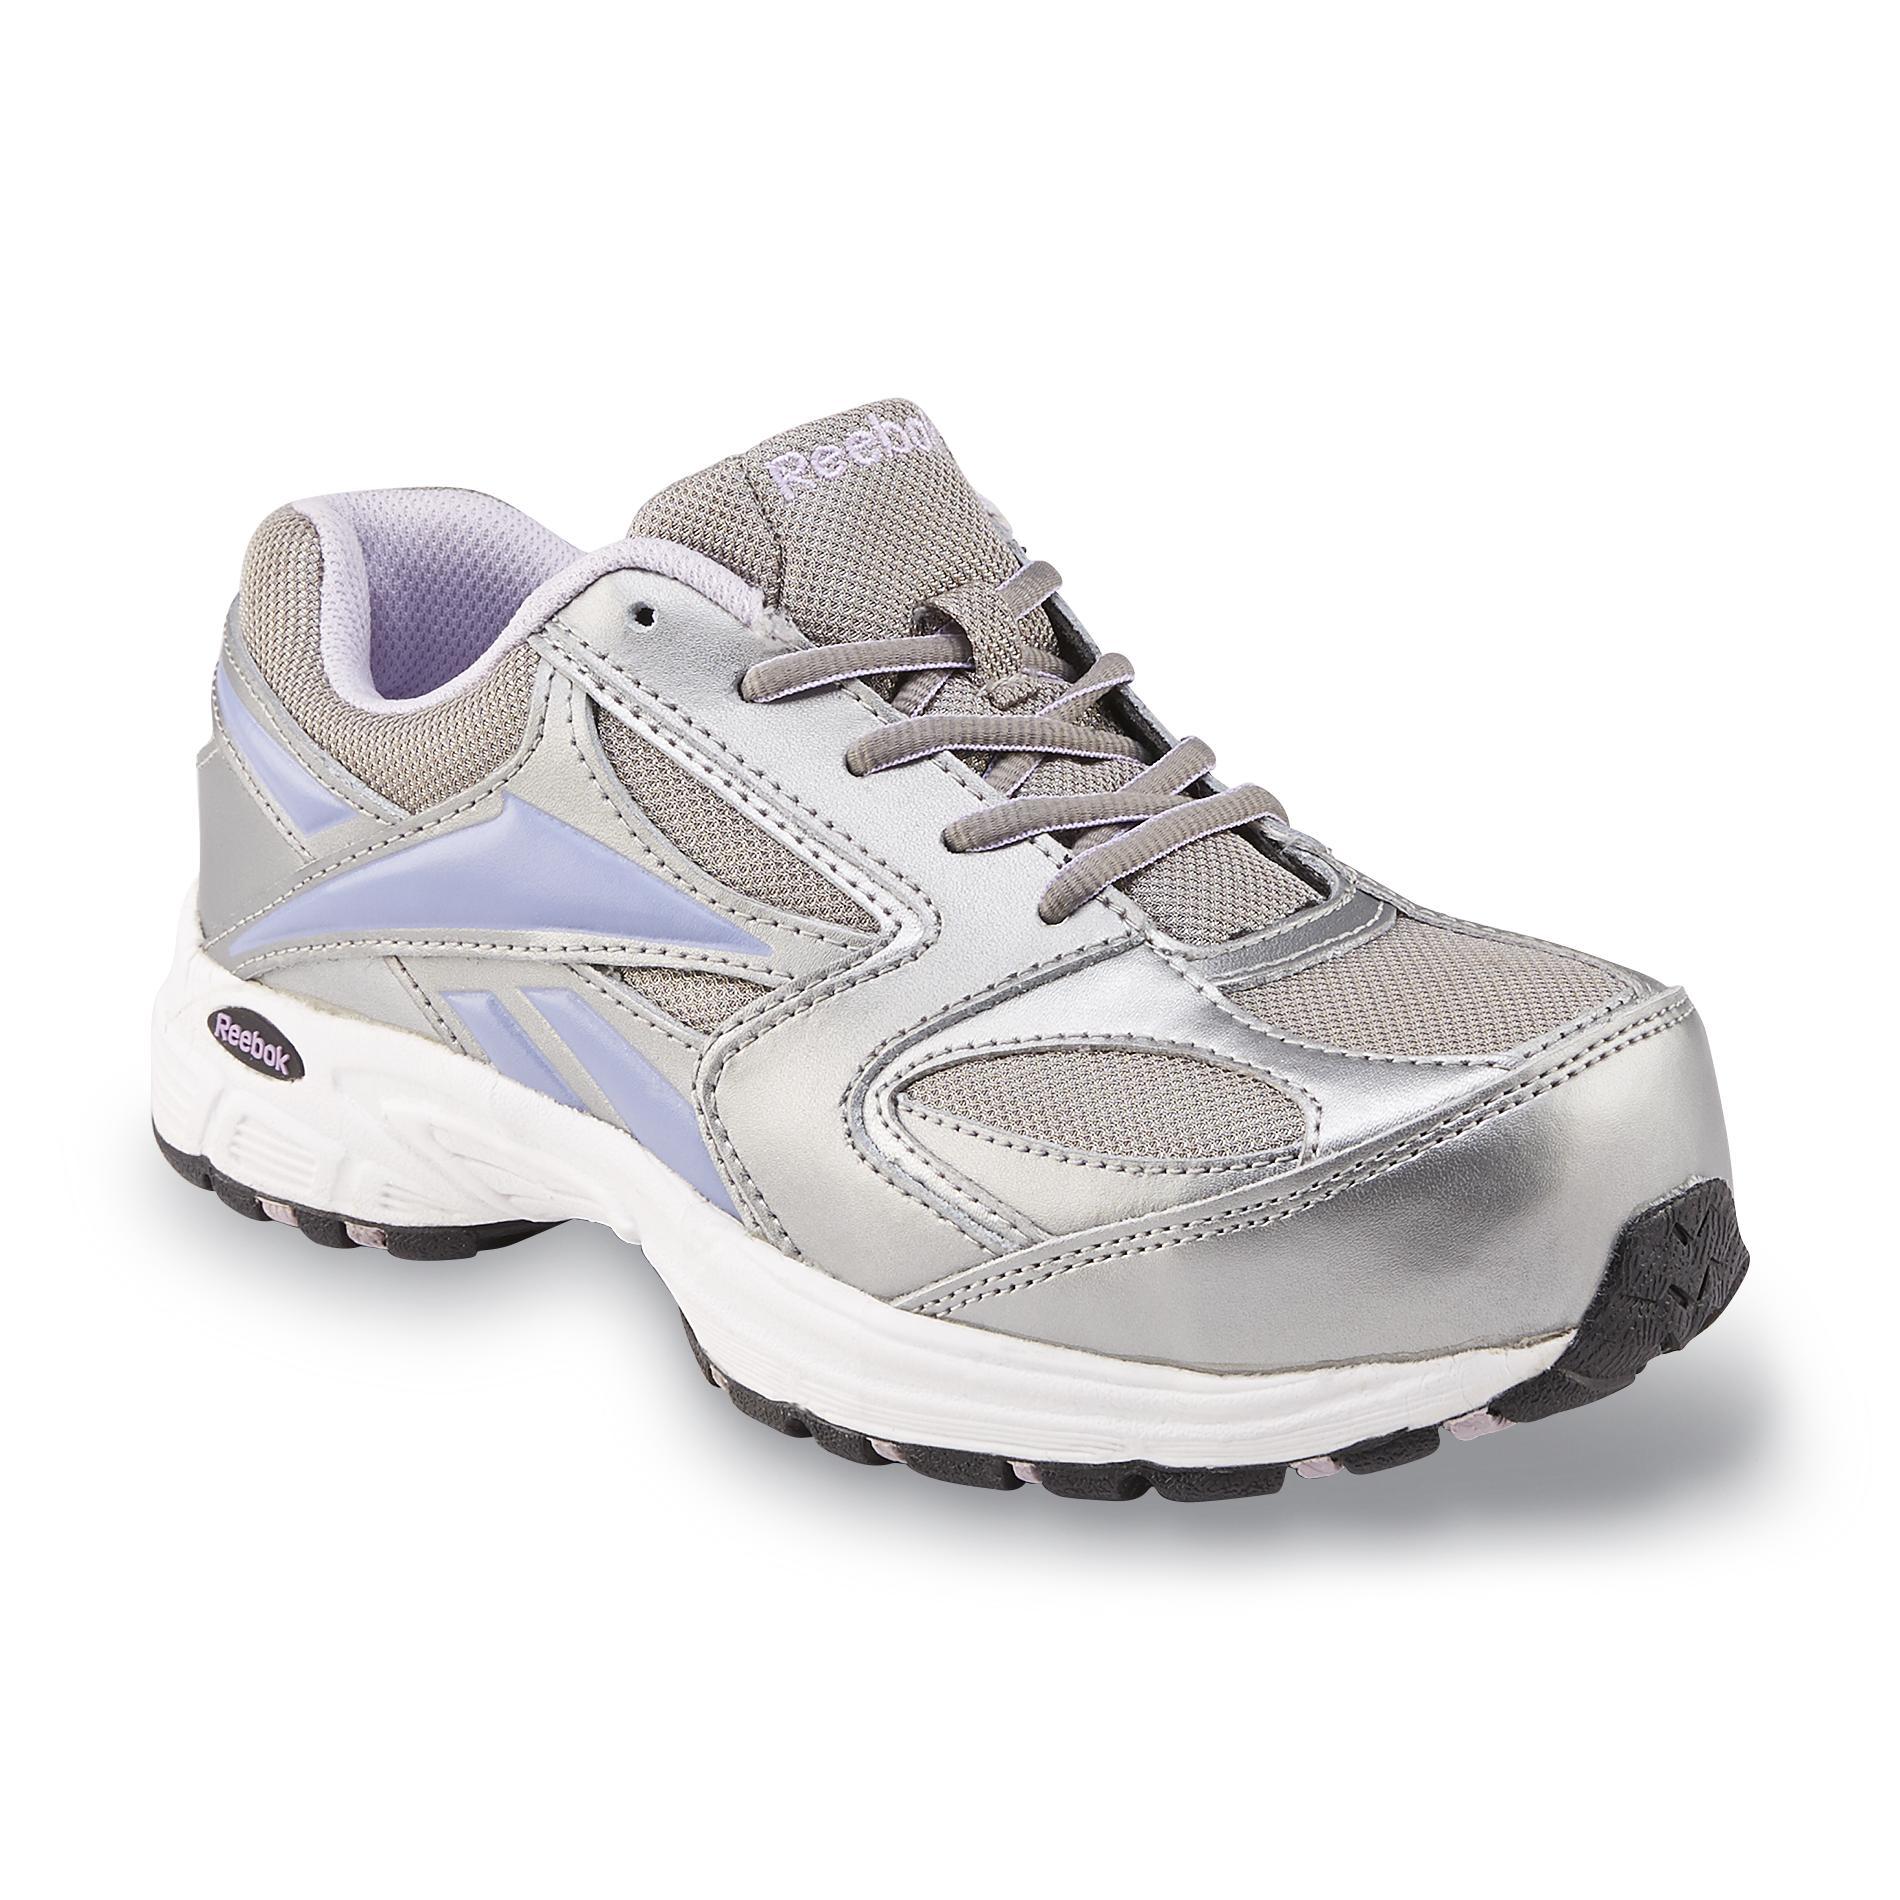 reebok work s composite toe work shoe grey purple